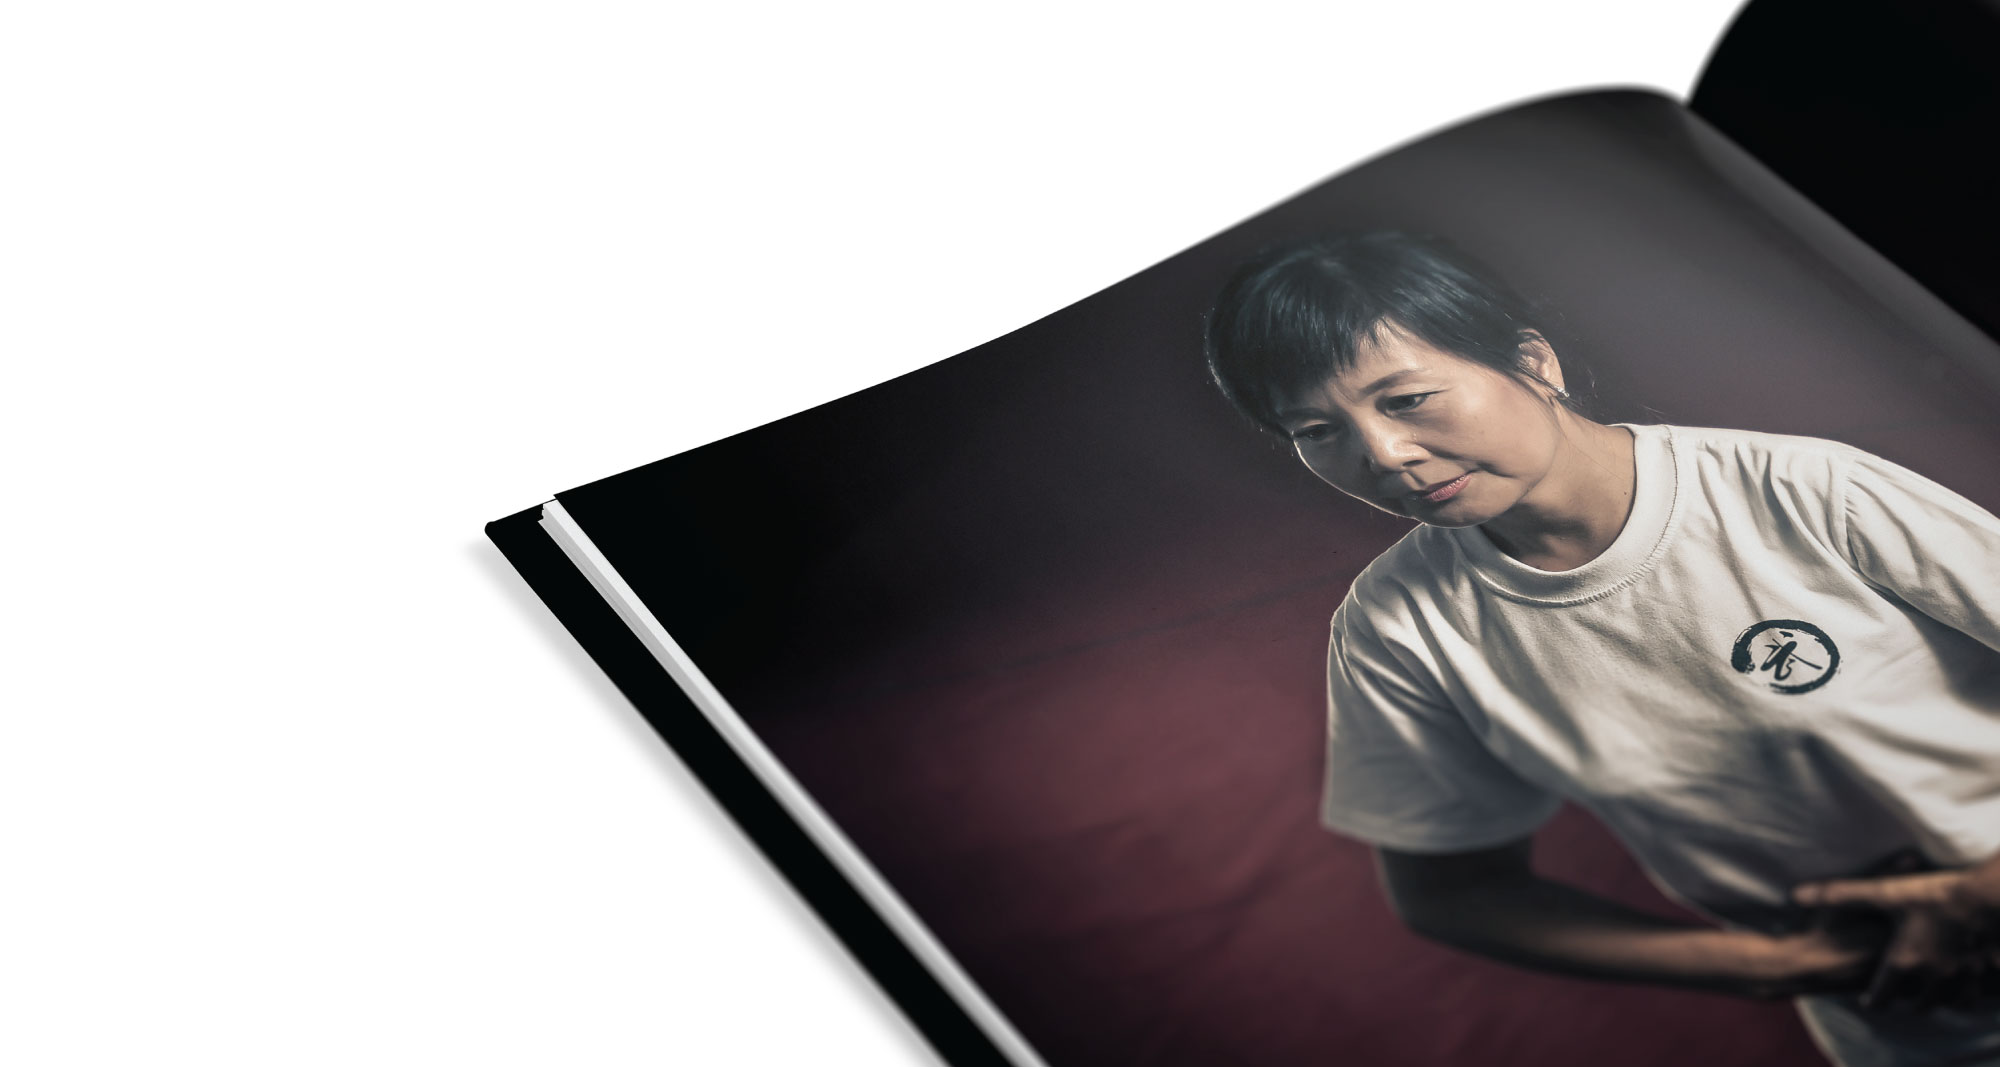 Hard-Work-Wushu-Kungfu-wushu-taichi-akademie